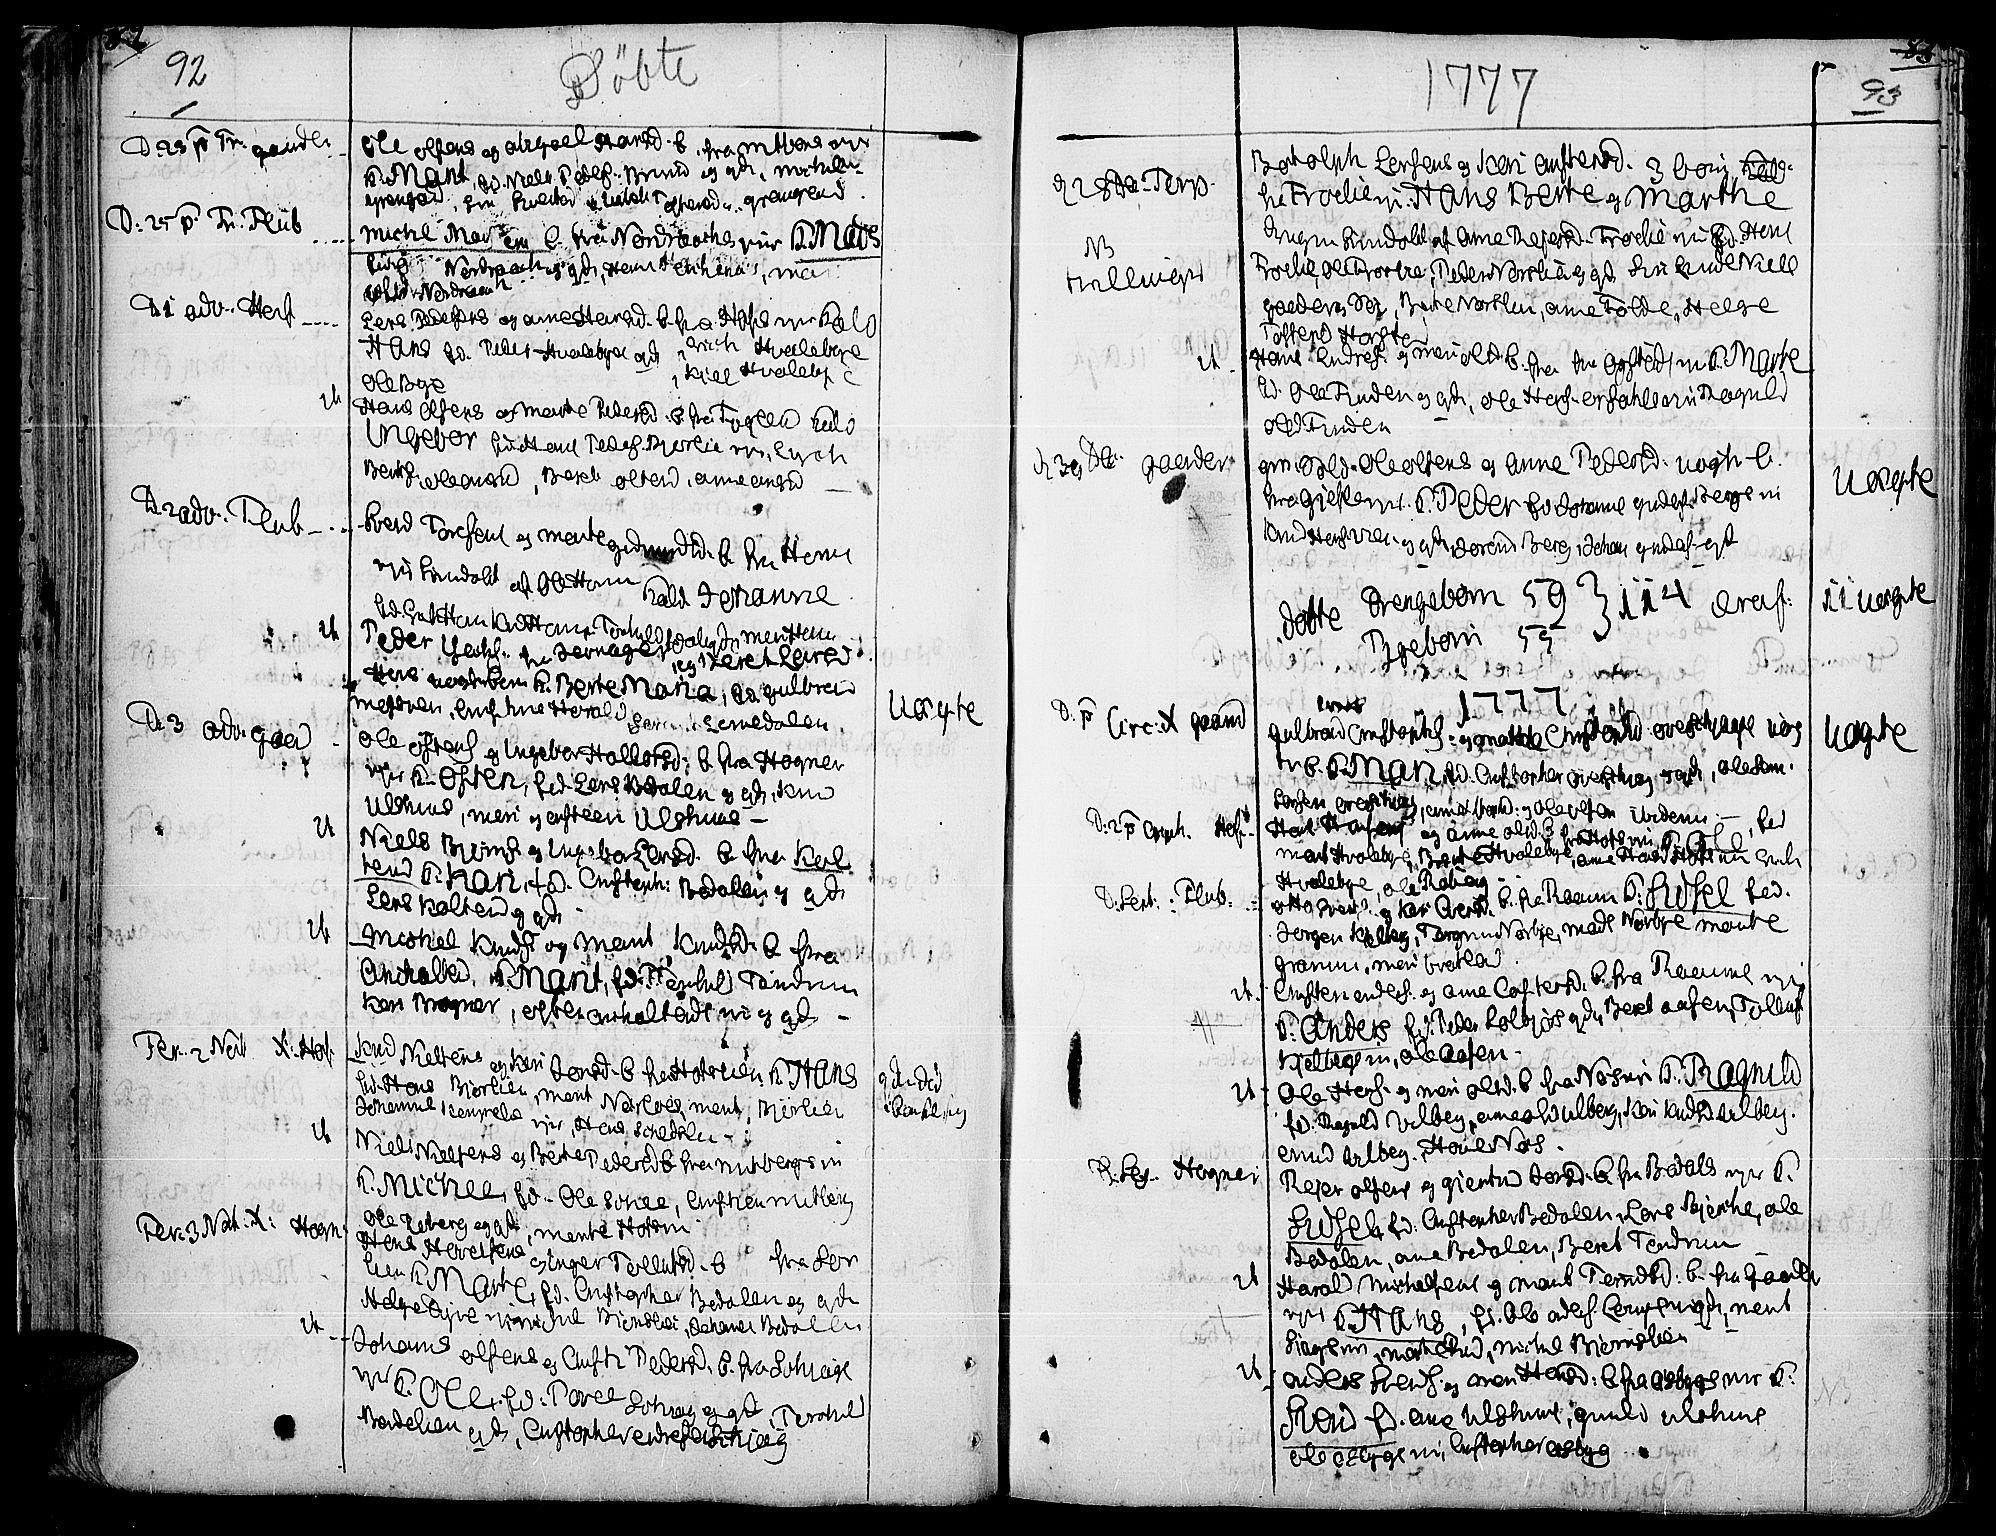 SAH, Land prestekontor, Ministerialbok nr. 5, 1765-1784, s. 92-93